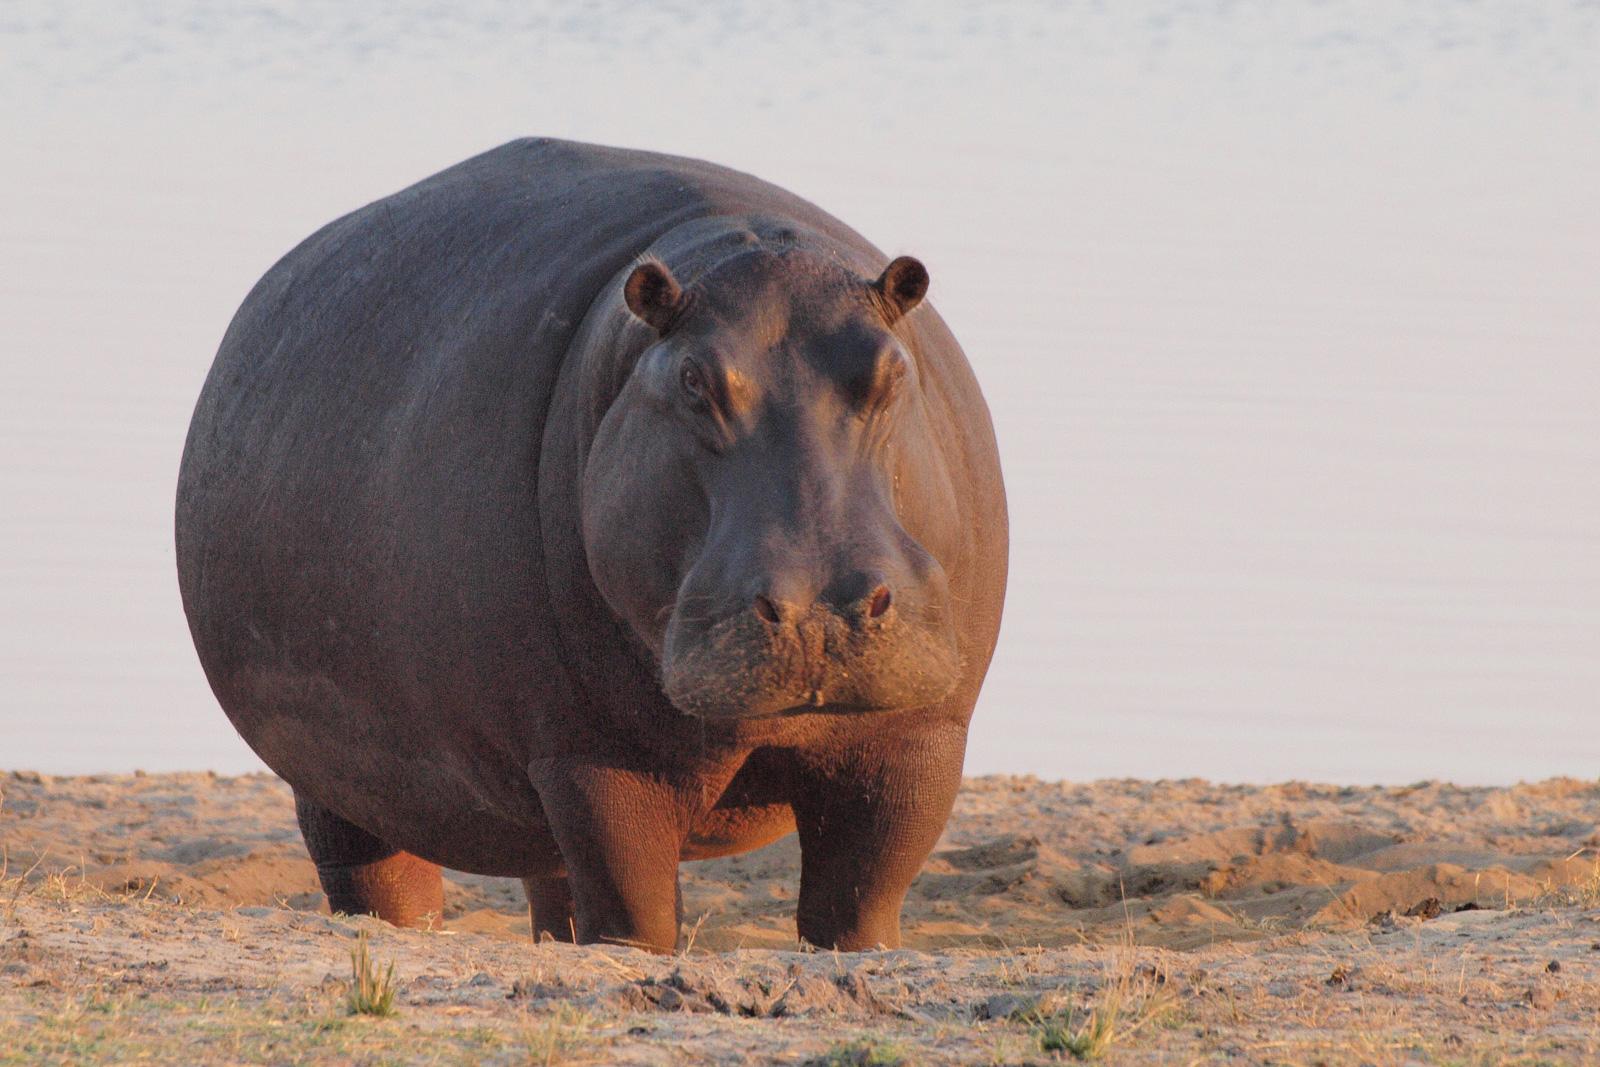 Hippopotamus. Photo credit: Gusjer. https://commons.wikimedia.org/wiki/File:Hippo_at_dawn.jpg